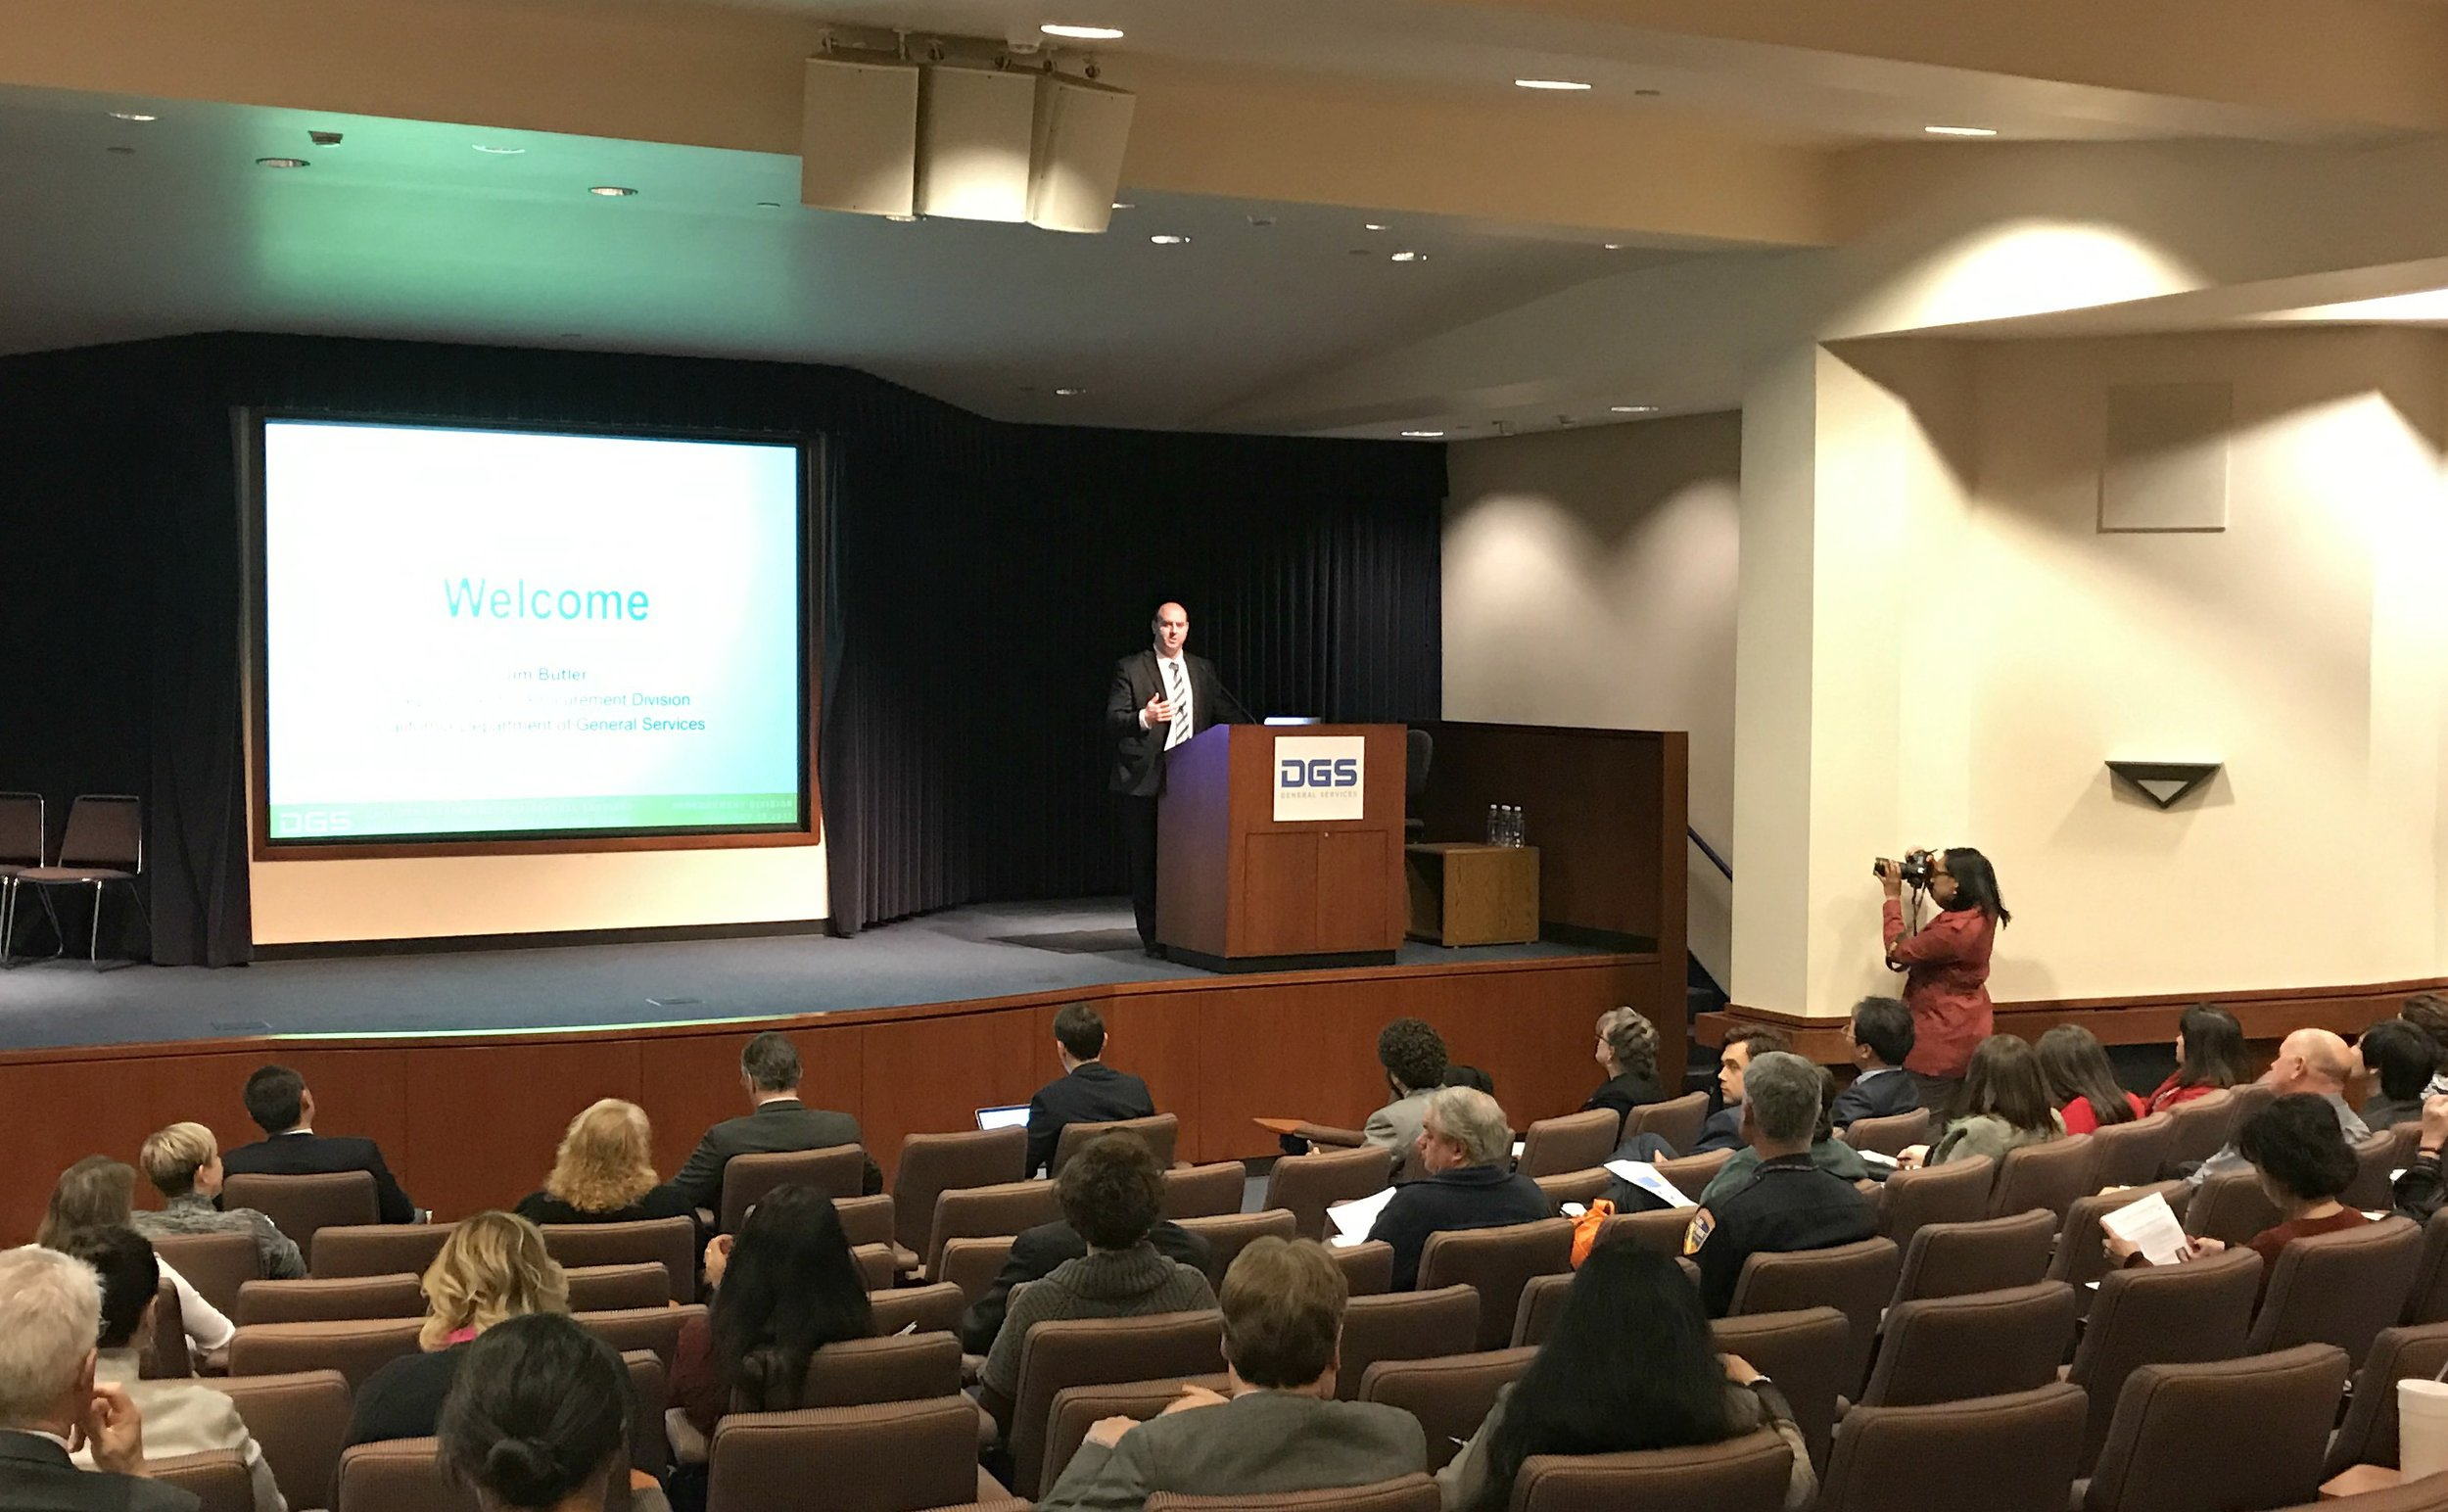 Jim Butler presents opening remarks